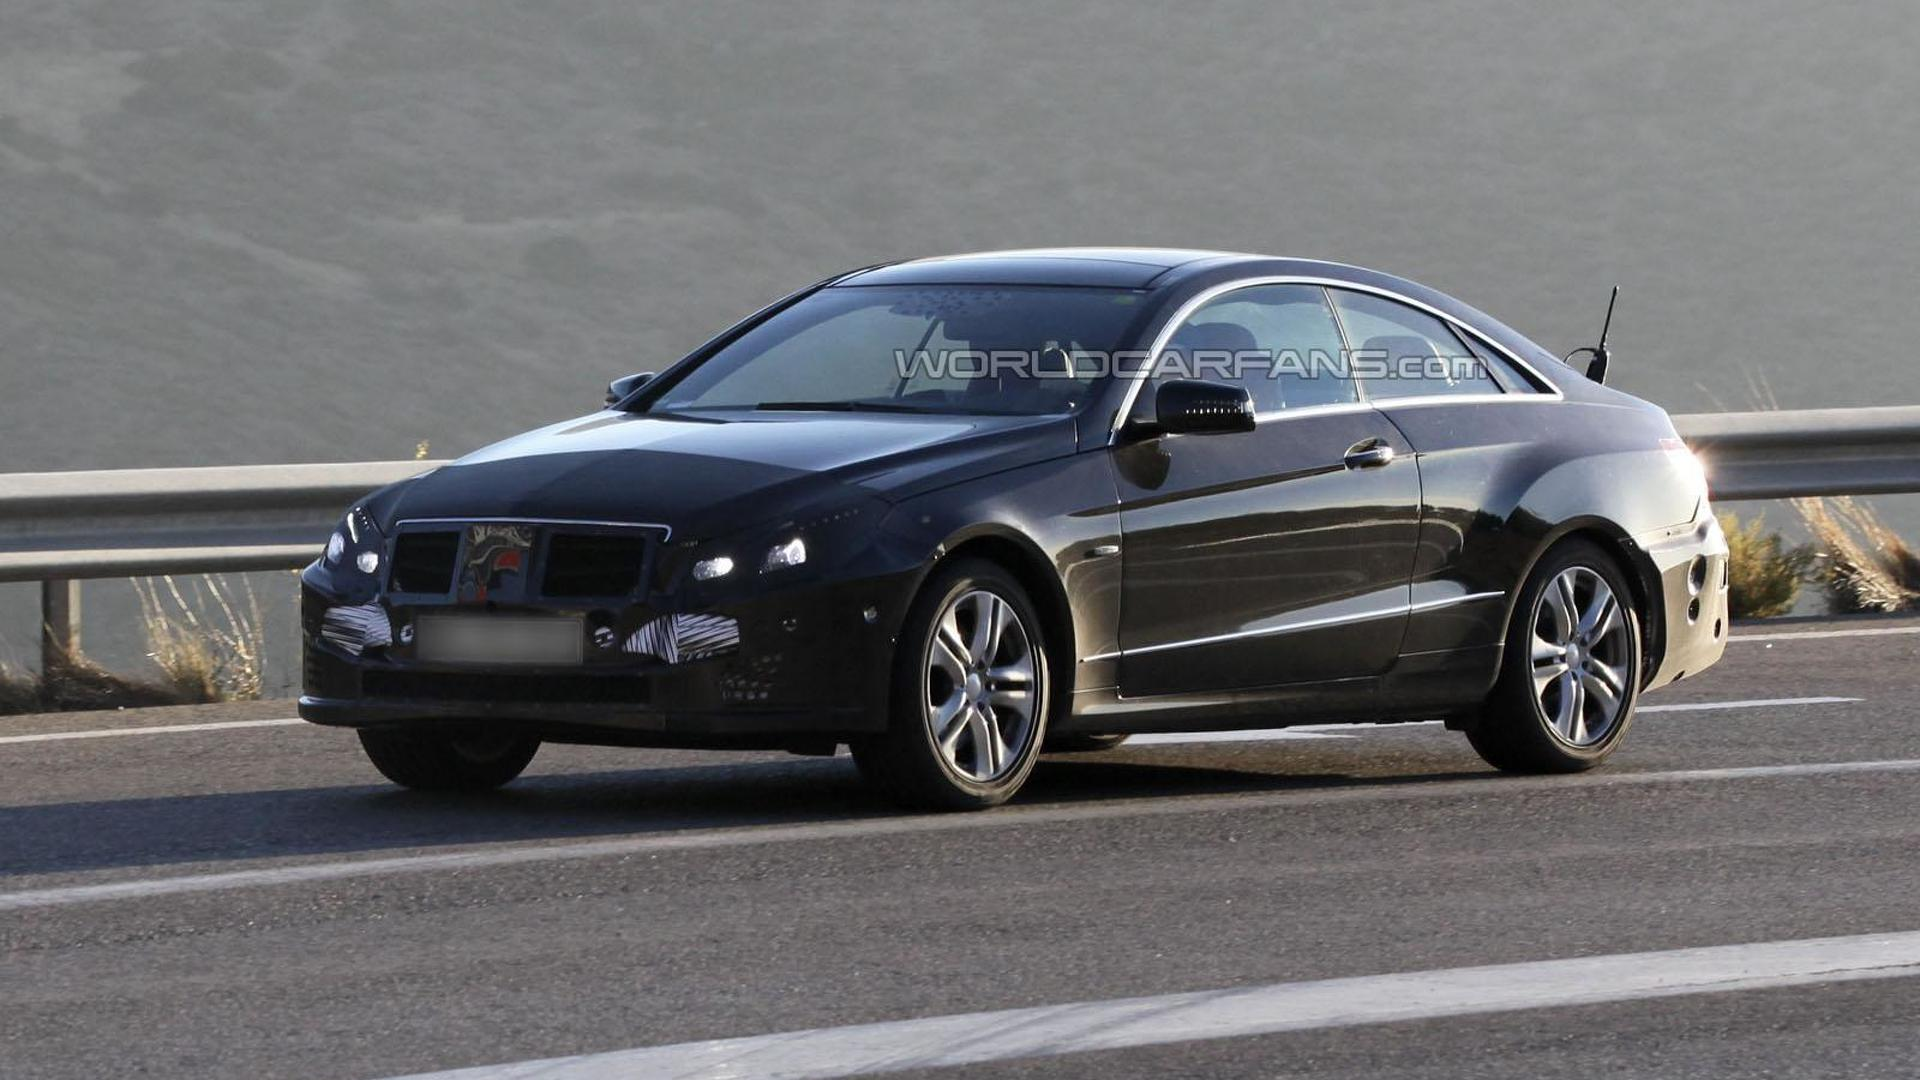 2014 Mercedes E-Class Coupe facelift spied